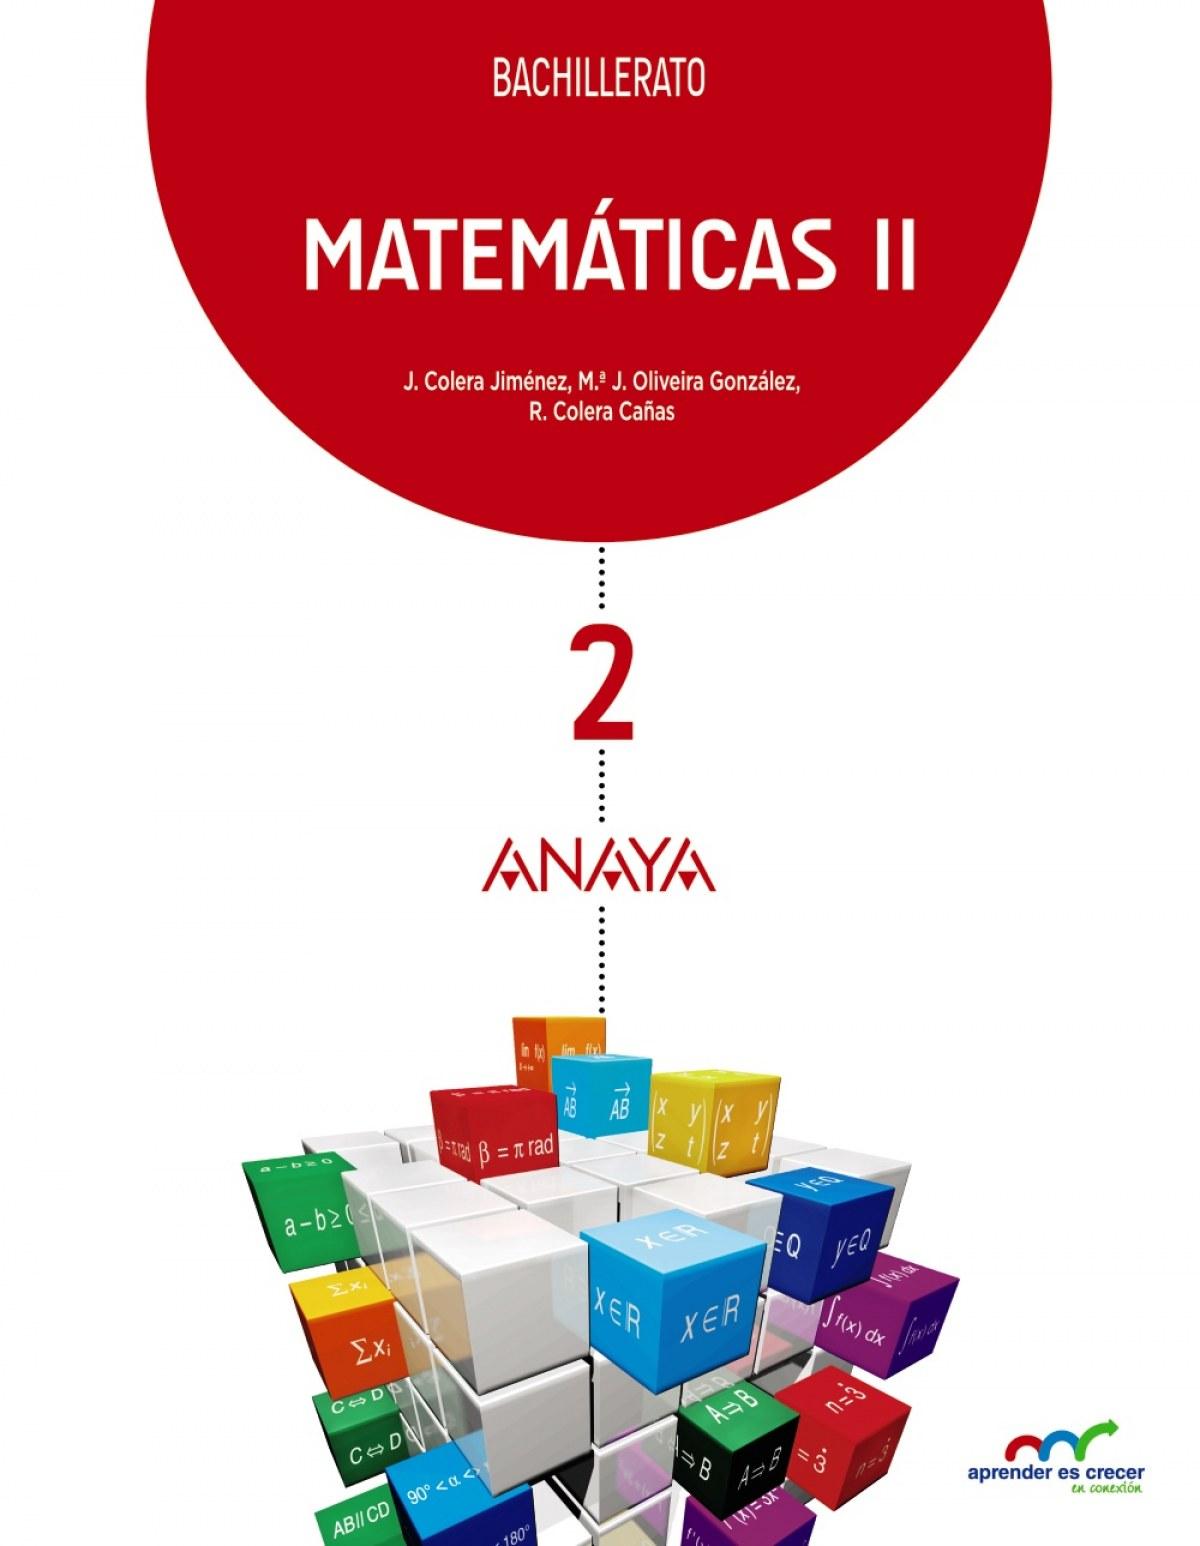 Matematicas ii 2o..bach naturales aprender crecer 2016 9788469812778